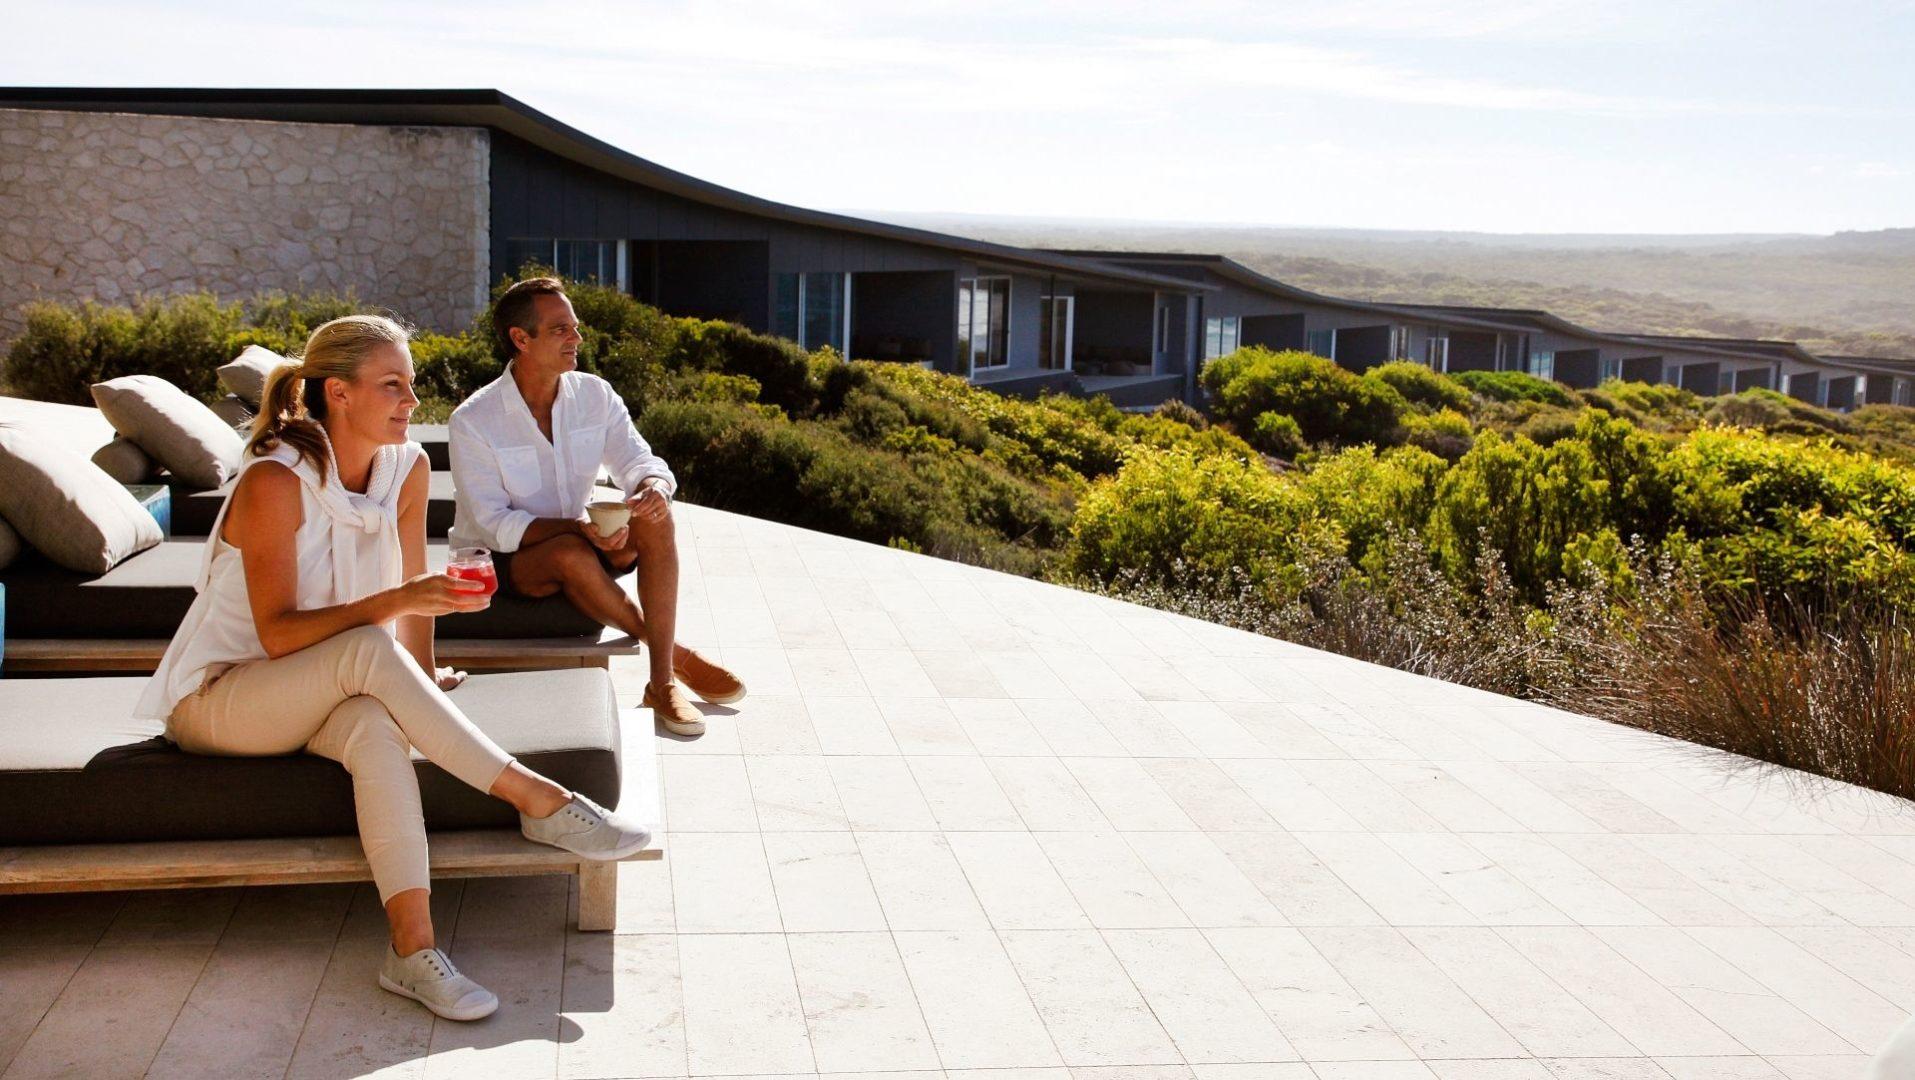 Enjoy amazing views on the terrace